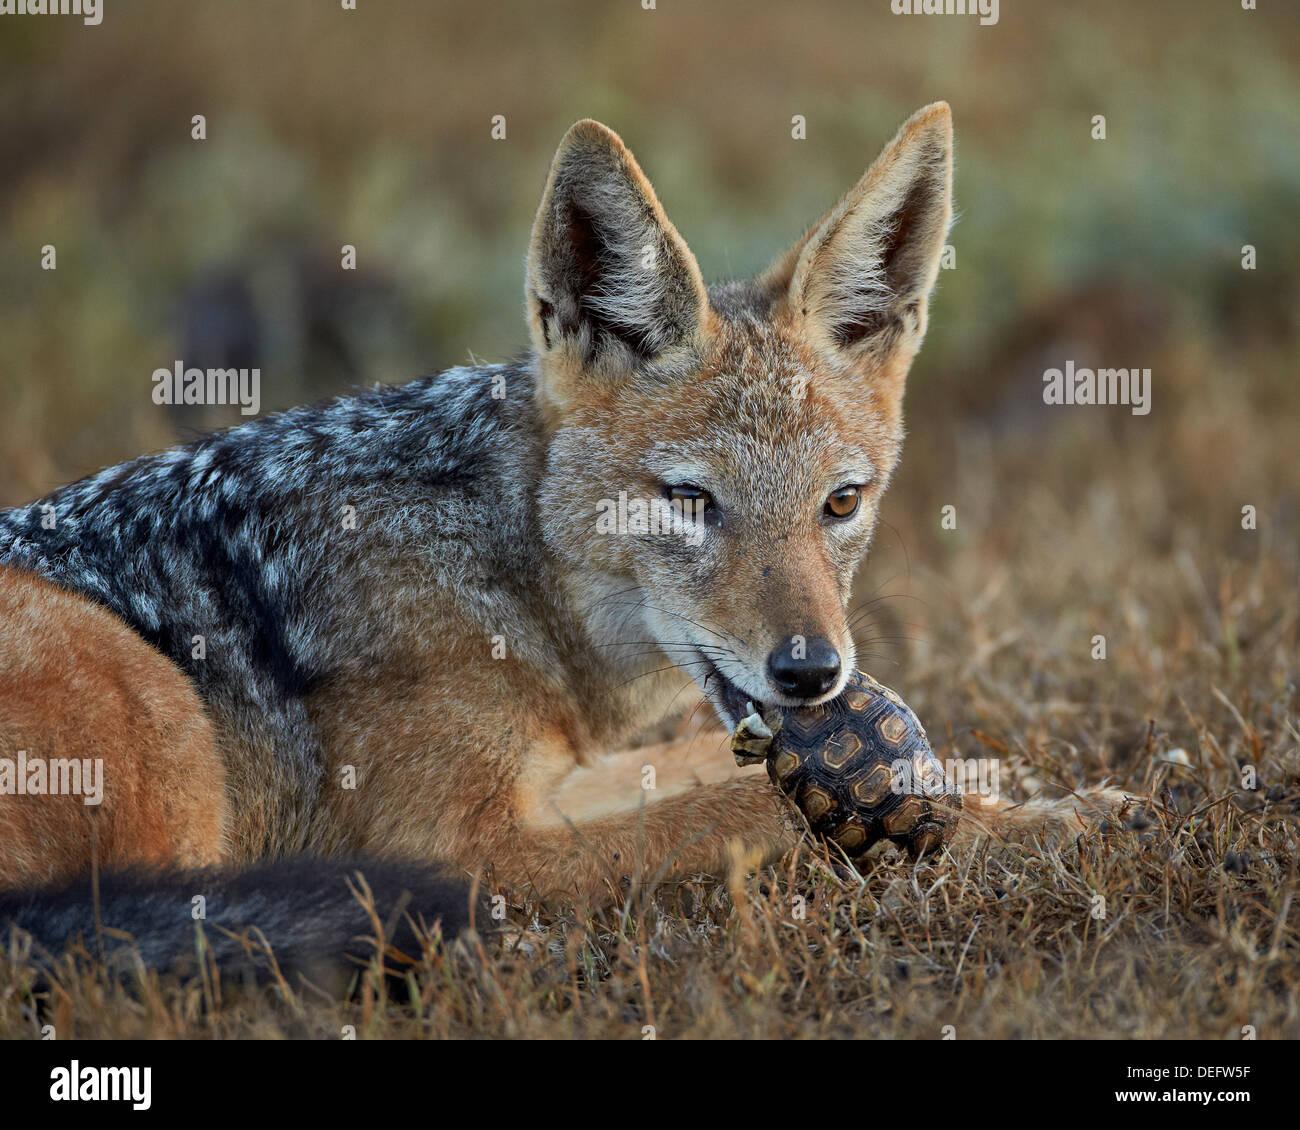 Black-backed jackal (Canis mesomelas) eating a Leopard tortoise (Geochelone pardalis), Addo Elephant National Park, South Africa - Stock Image